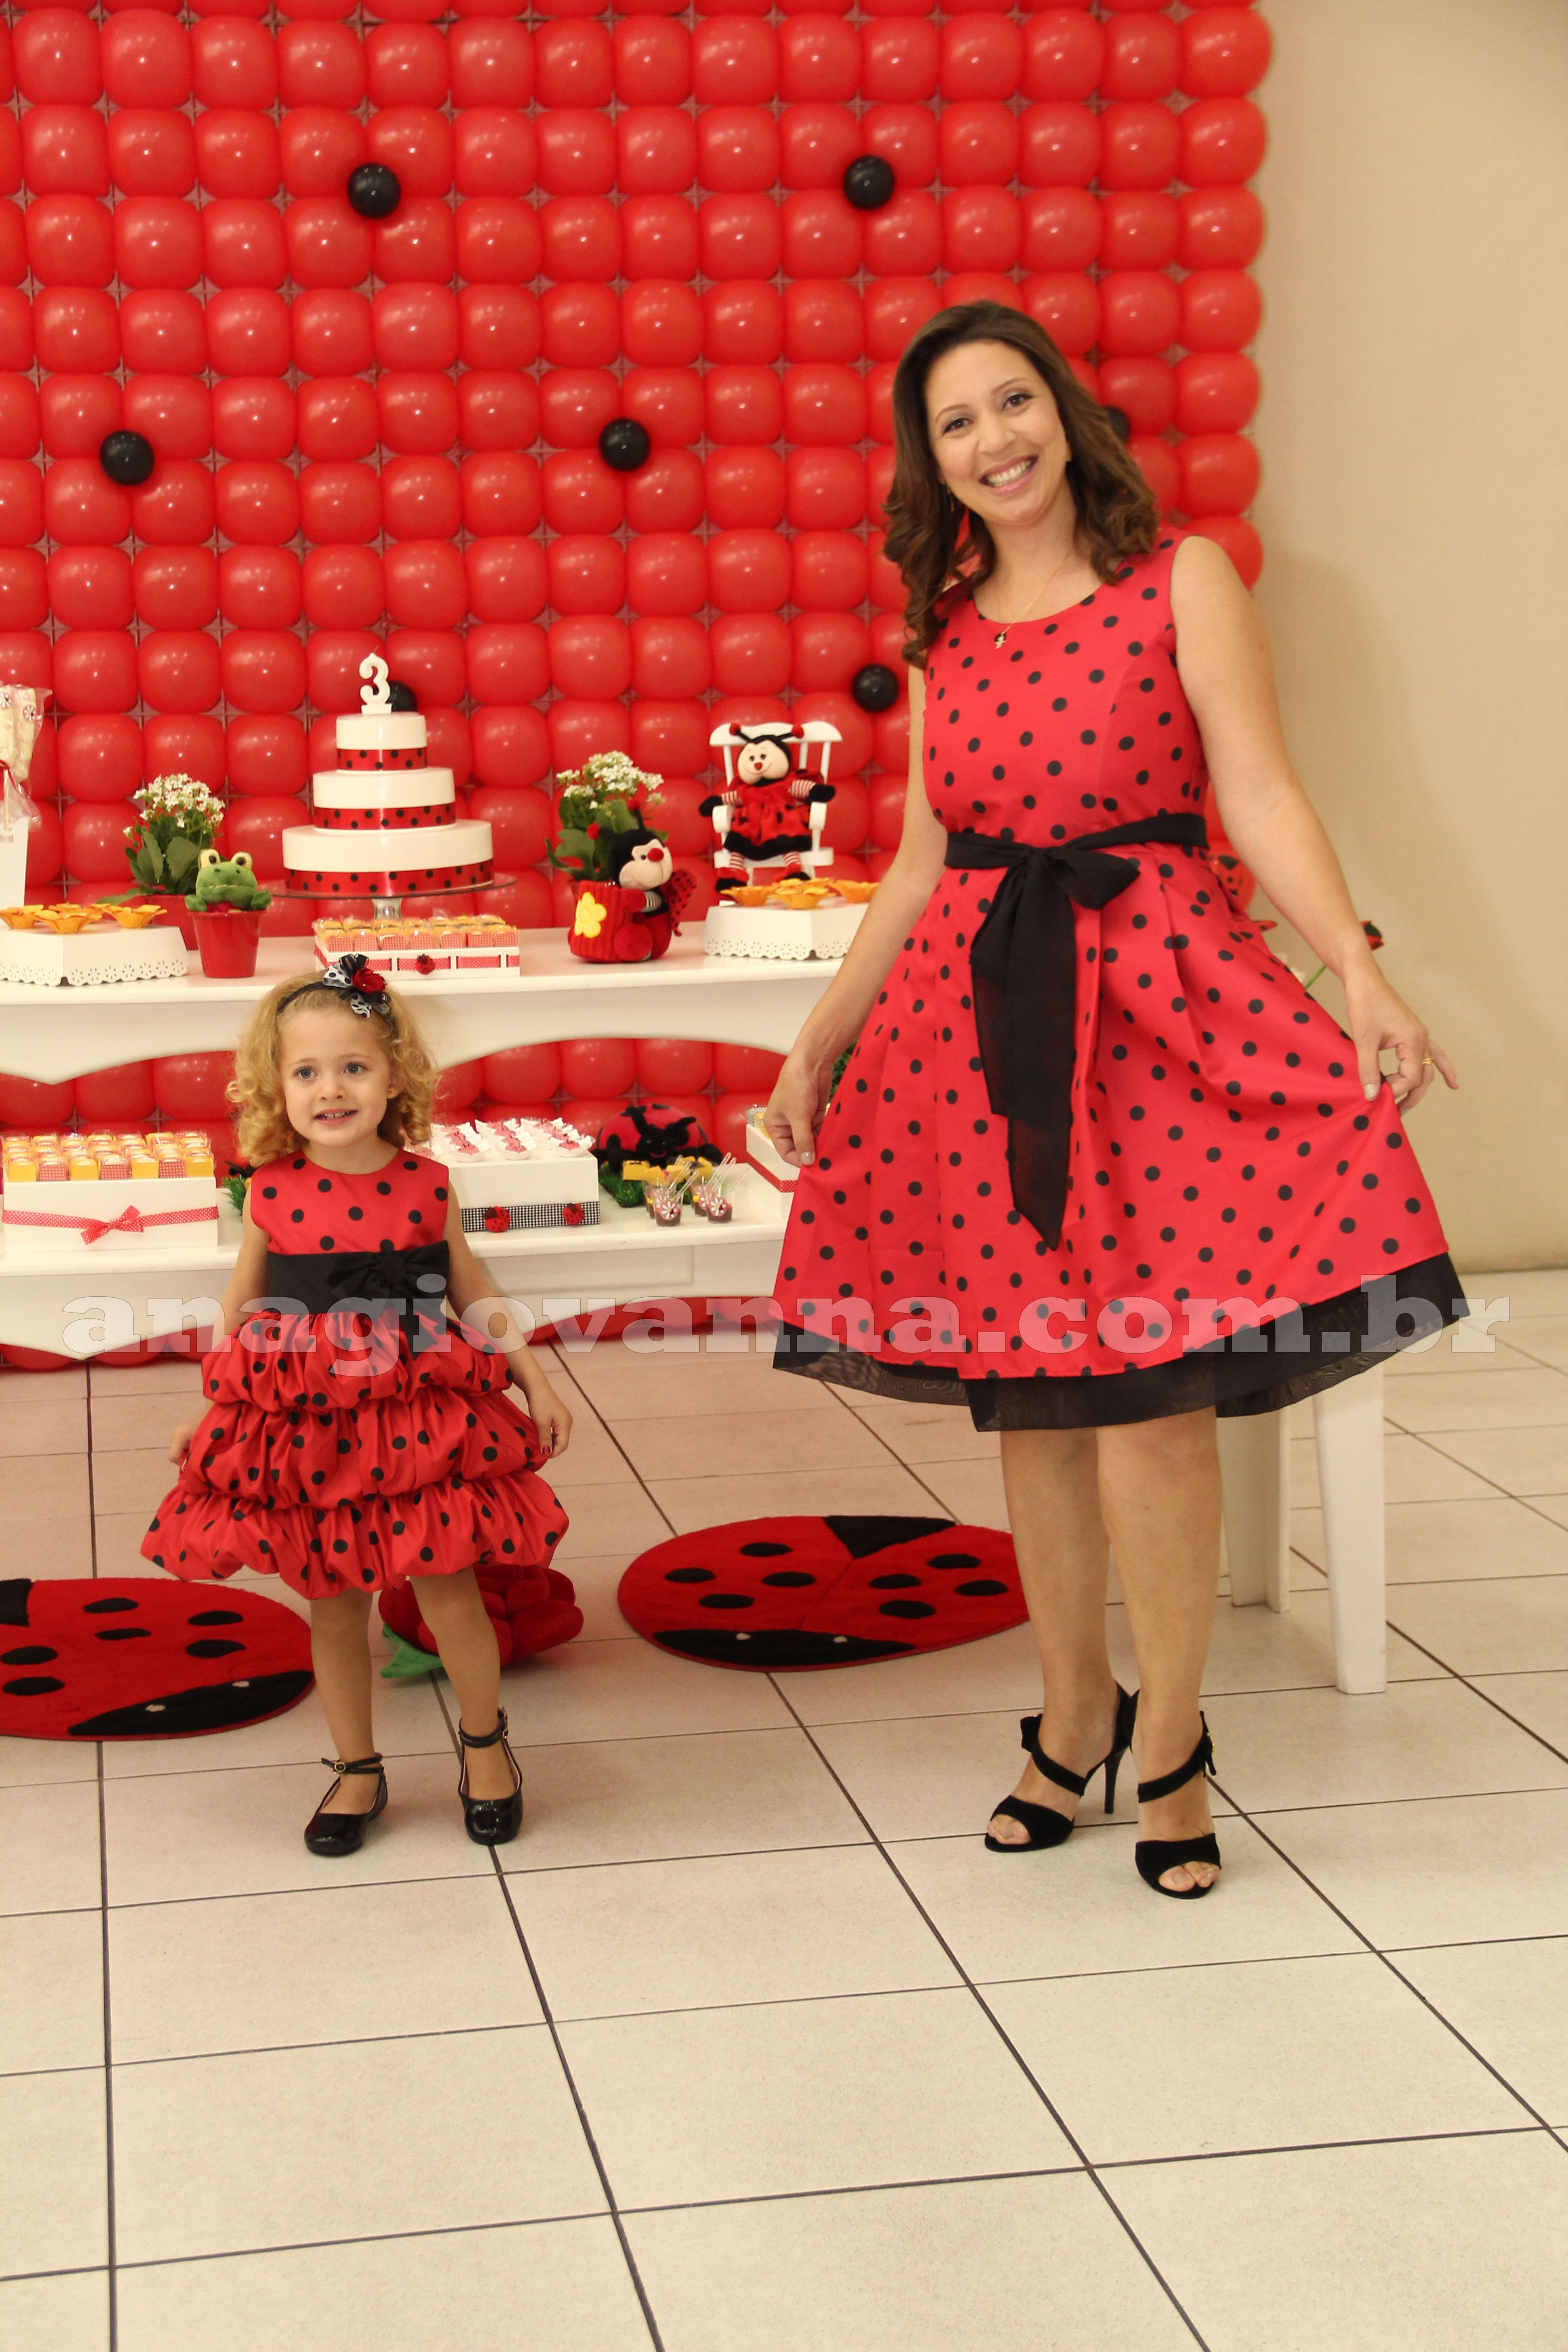 Vestido Joaninha para festa infantil - http://www.anagiovanna.com.br/blog/joaninha/vestido-joaninha-para-festa-infantil/